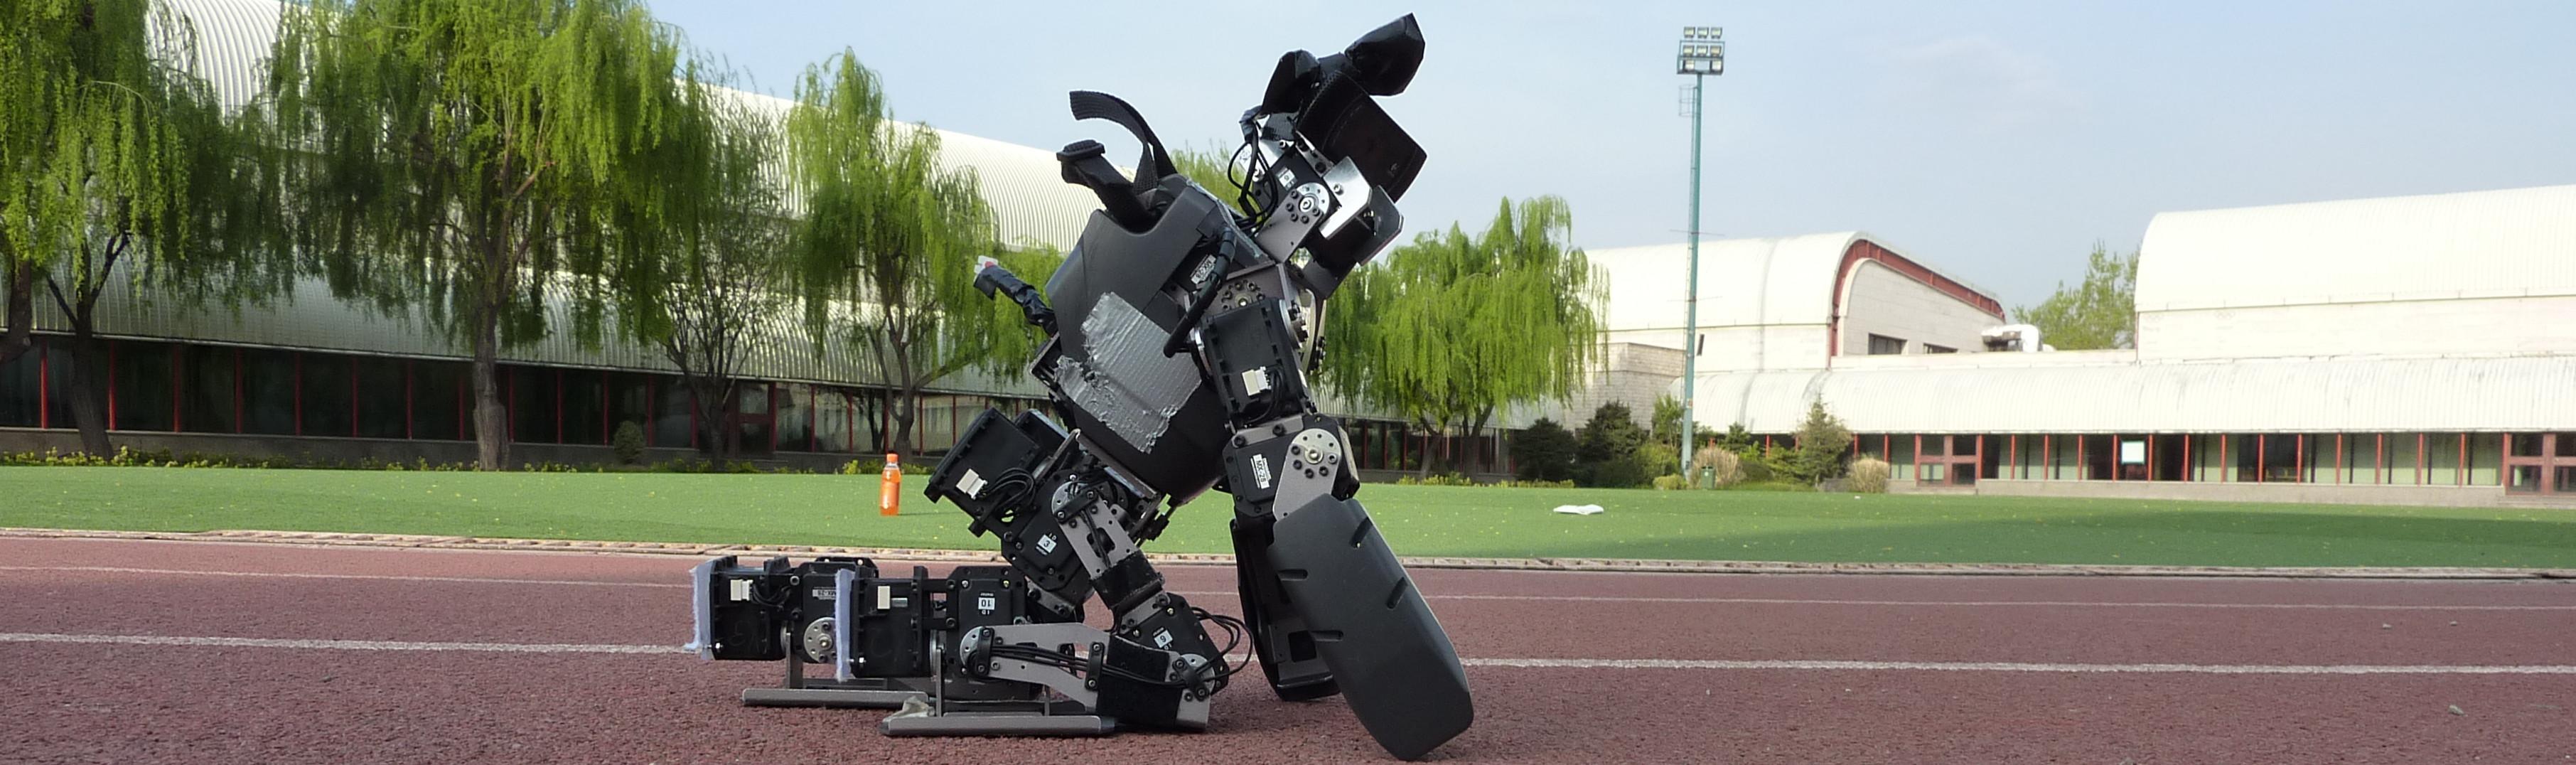 Hamburg bit bots robocup ag an der universit t hamburg for Hamburg universitat